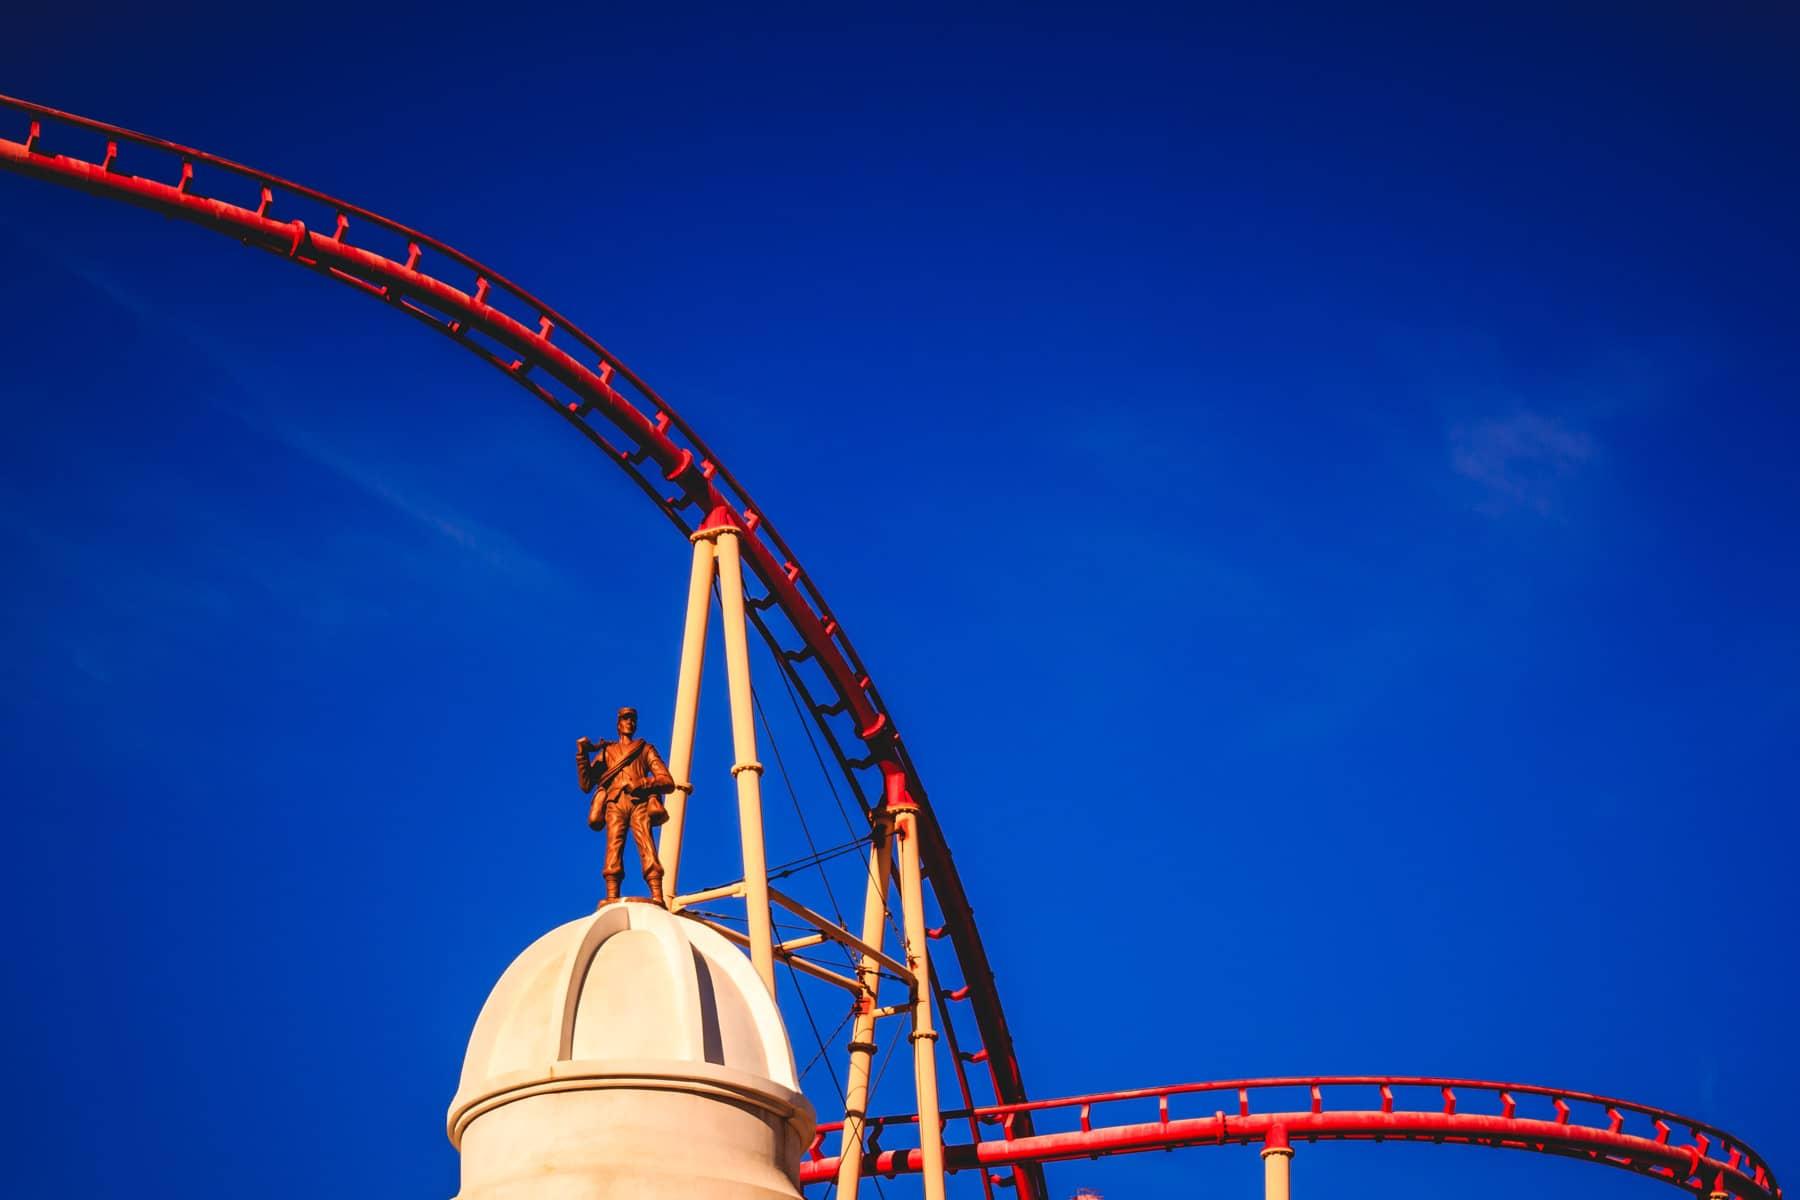 The casino's roller coaster arcs across the sky at New York New York Hotel & Casino, Las Vegas.